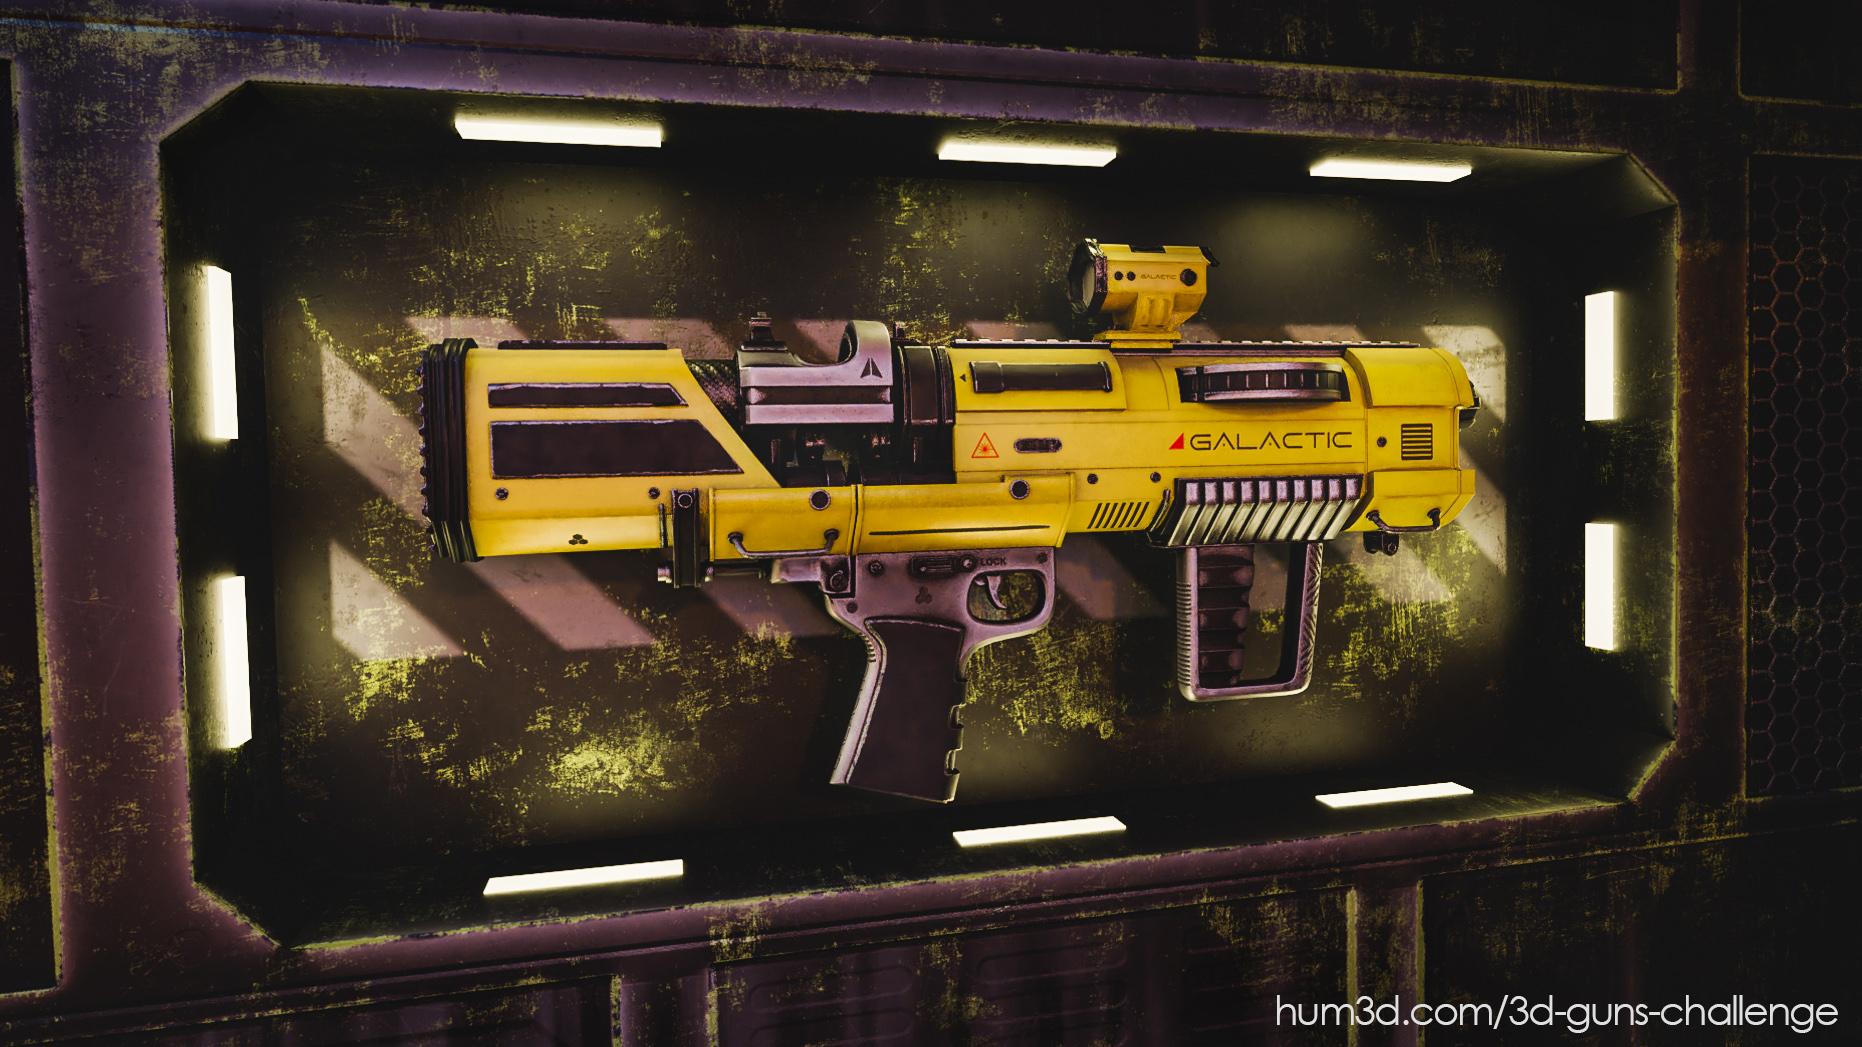 The Galactic Ion Pulse Gun 3d art